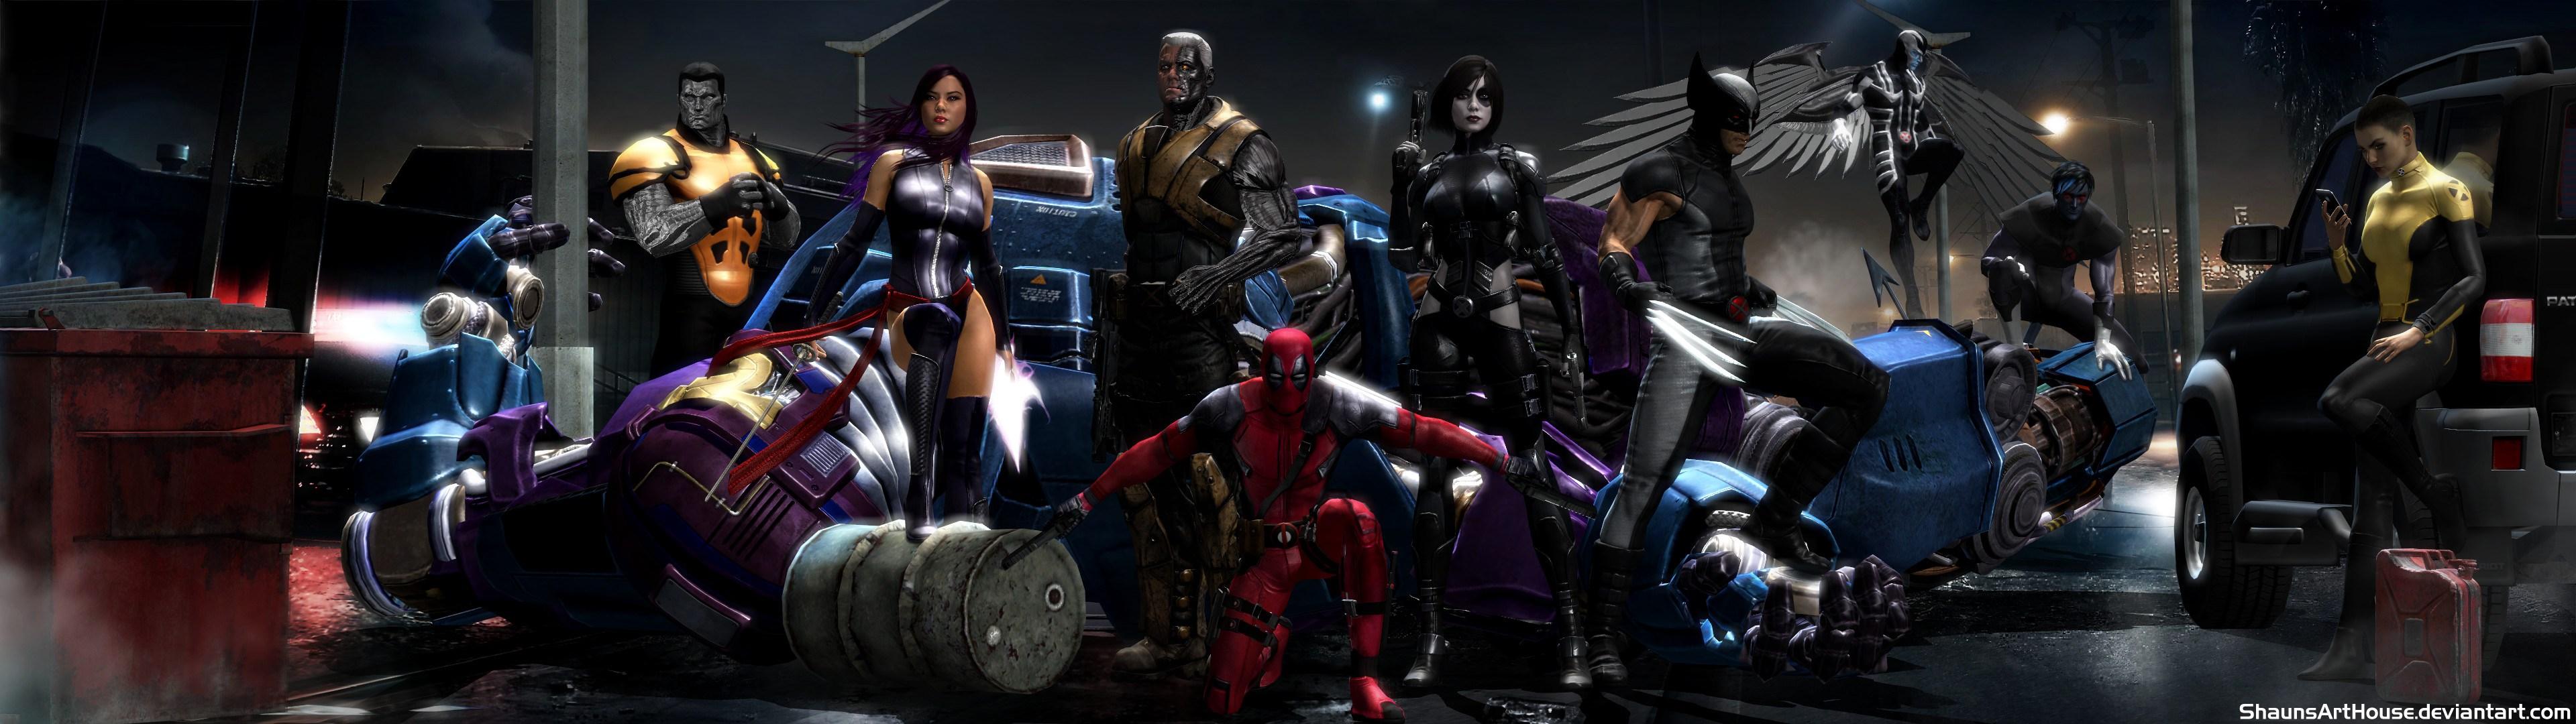 Deadpool X Force Hd Superheroes 4k Wallpapers Images